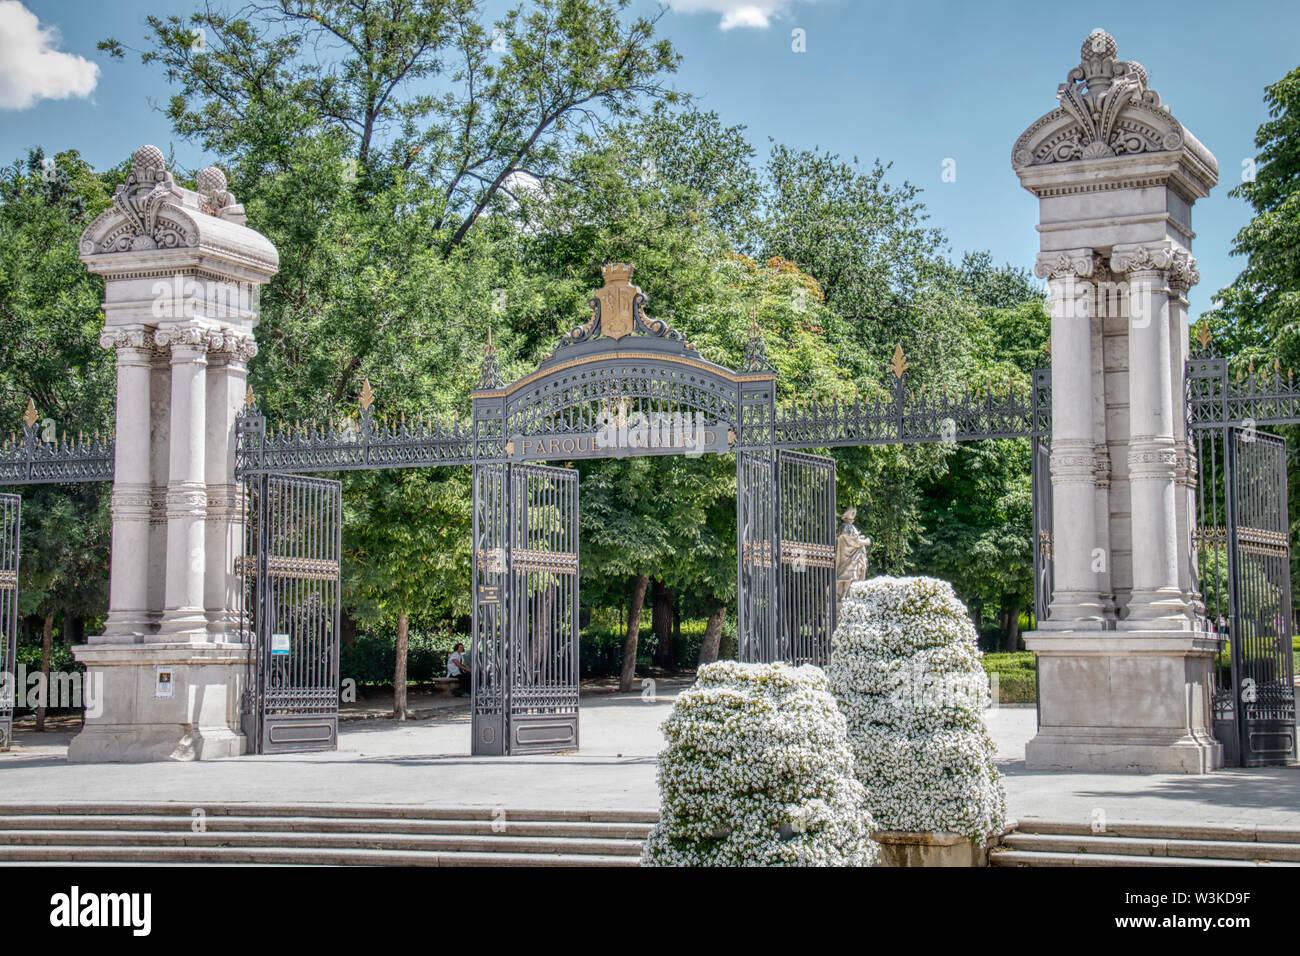 "Madrid, Spain - June 21, 2019: One of the entrances to the Buen Retiro Park (Spanish: Parque del Buen Retiro, literally ""Park of the Pleasant Retreat"" Stock Photo"